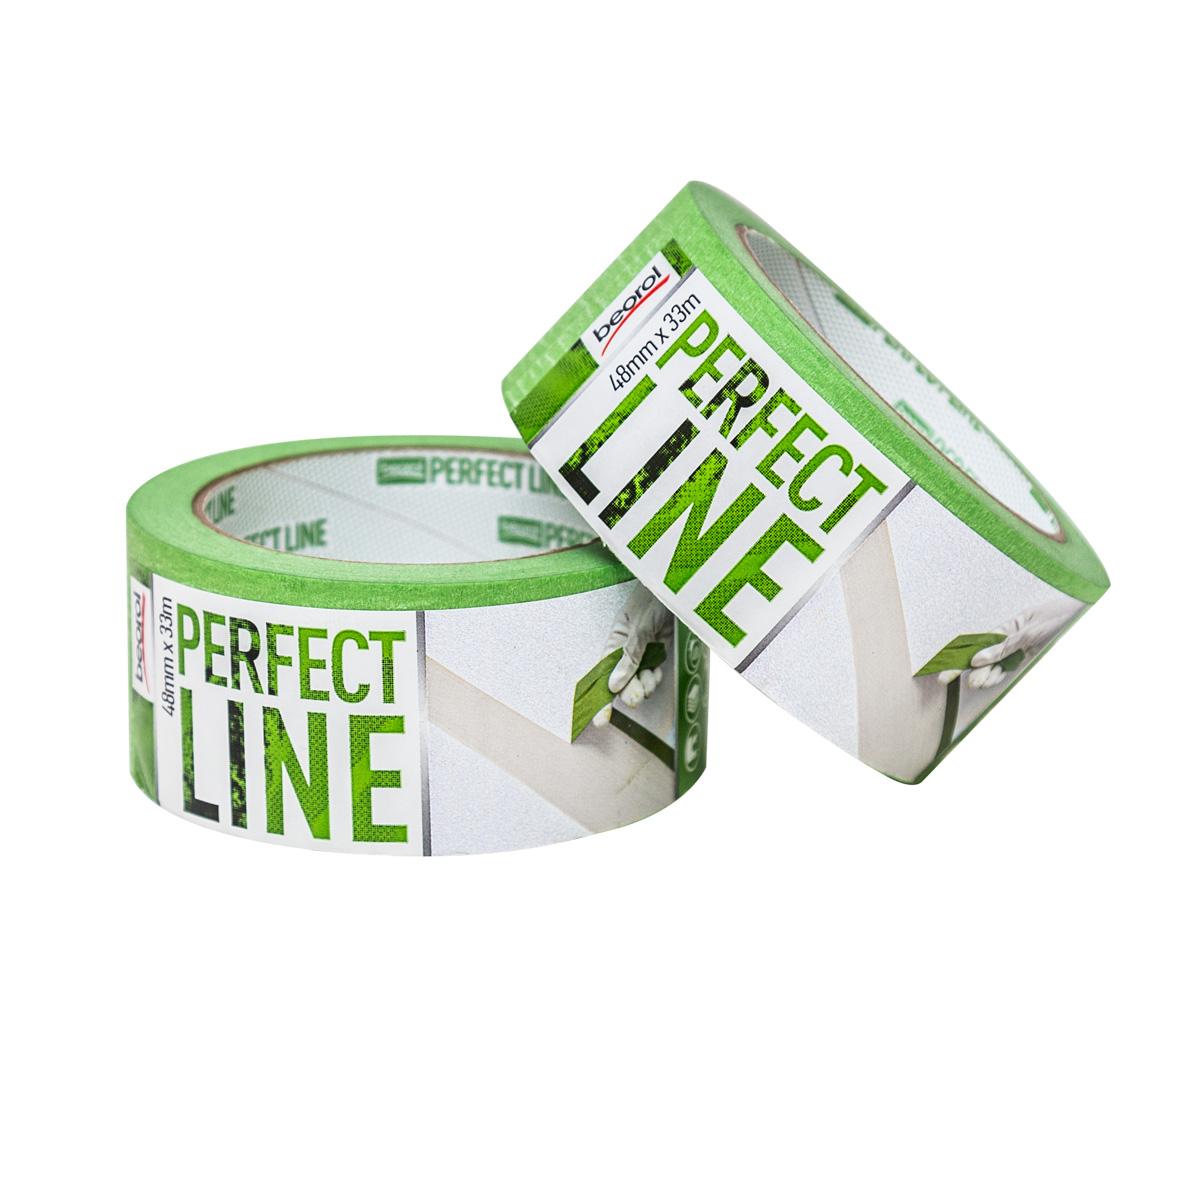 Krep traka Perfect line 48mm x 33m